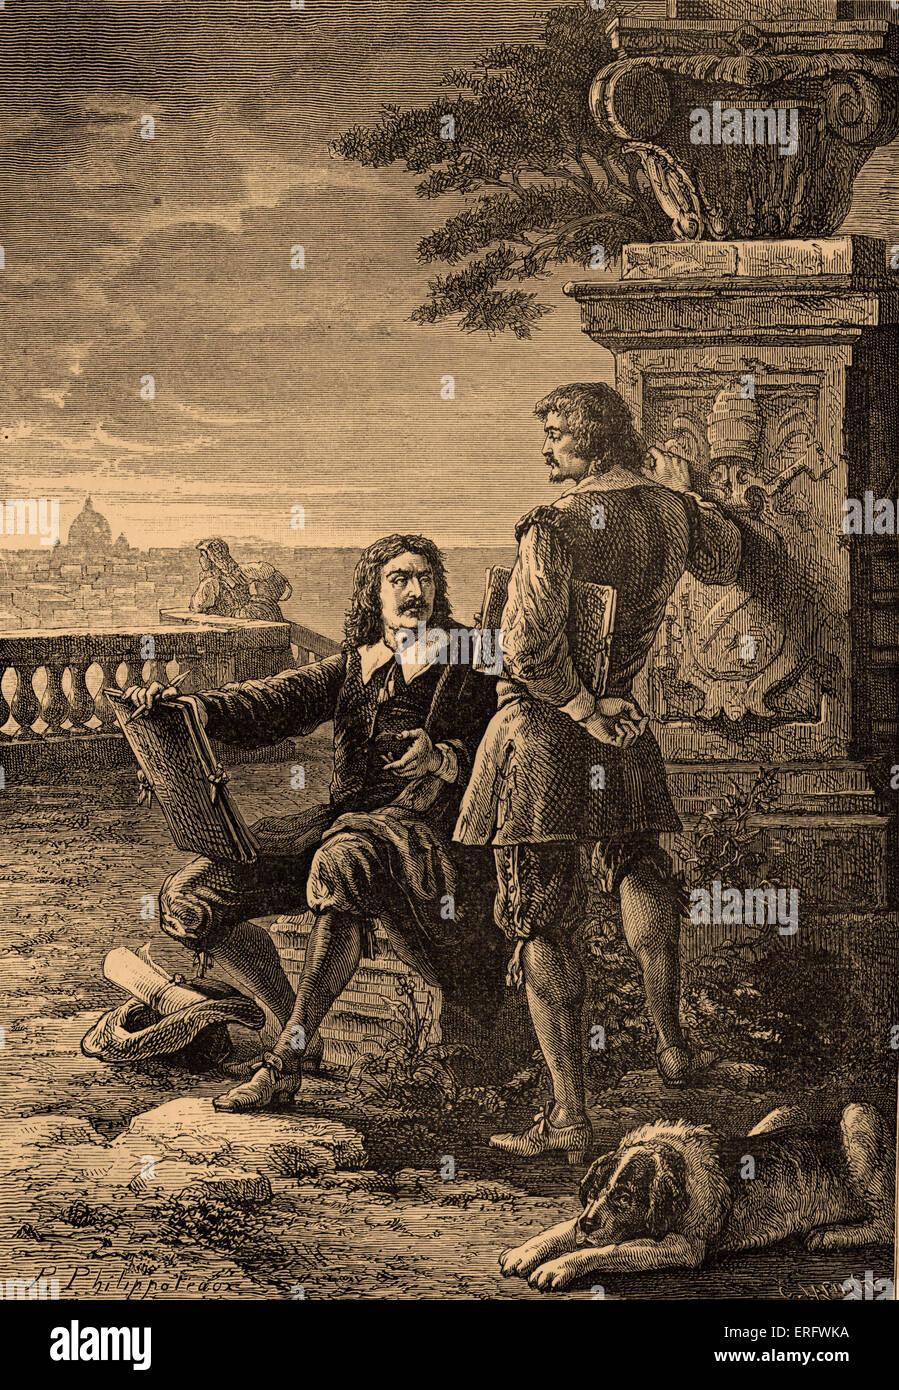 Nicholas Poussin and Claude Lorrain. Claude Lorrain   was an artist of the Baroque era. Nicolas Poussin was a classical - Stock Image